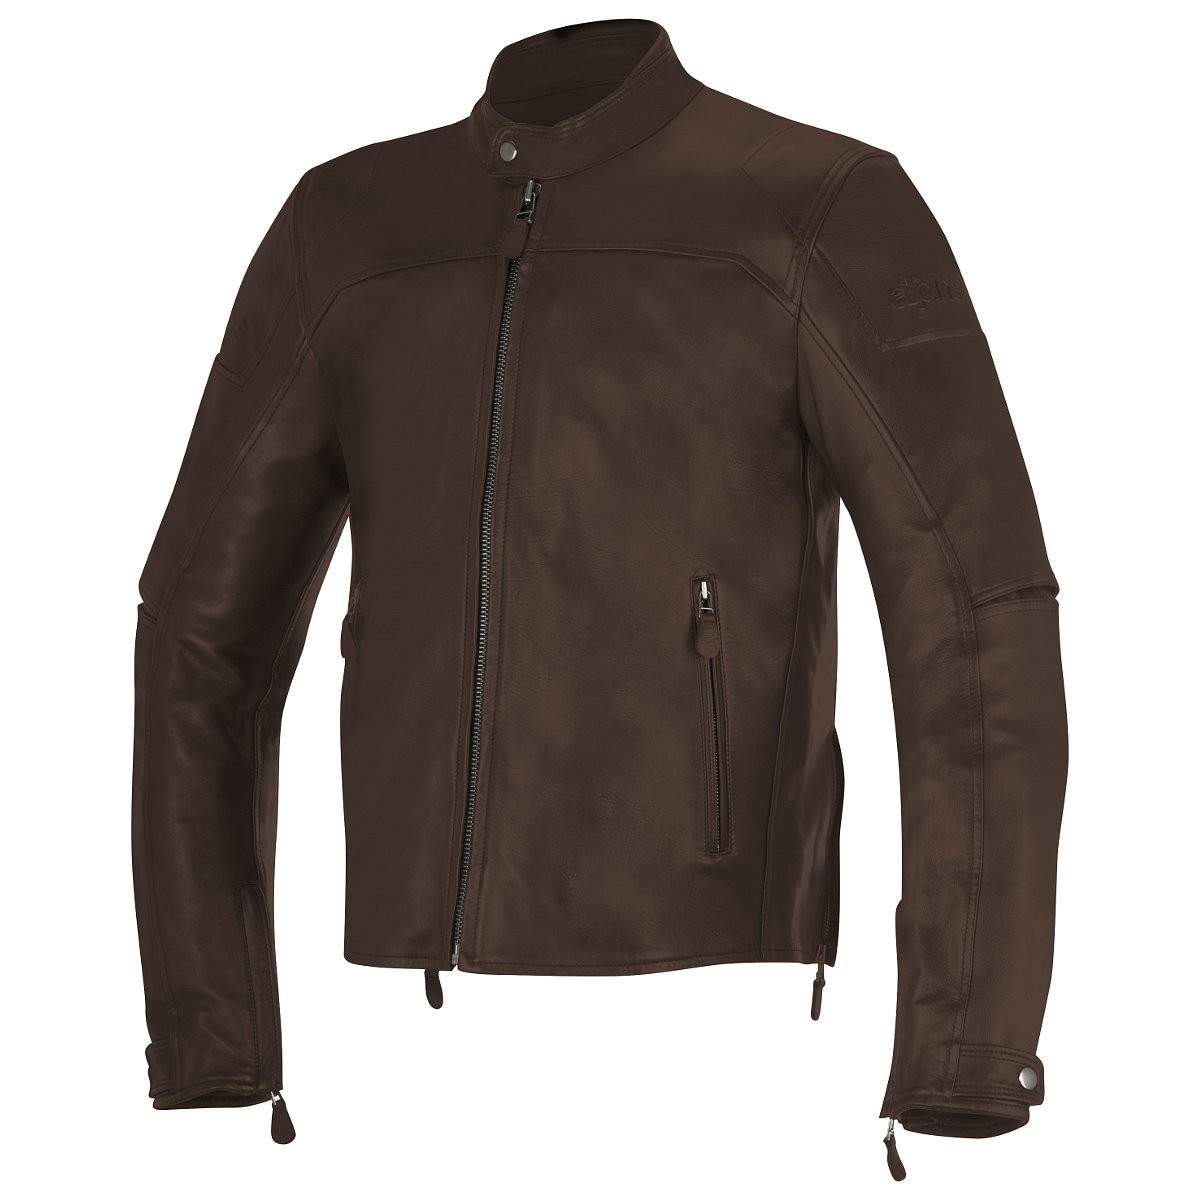 Leather jacket brown -  Alpinestars Brera Leather Jacket Brown